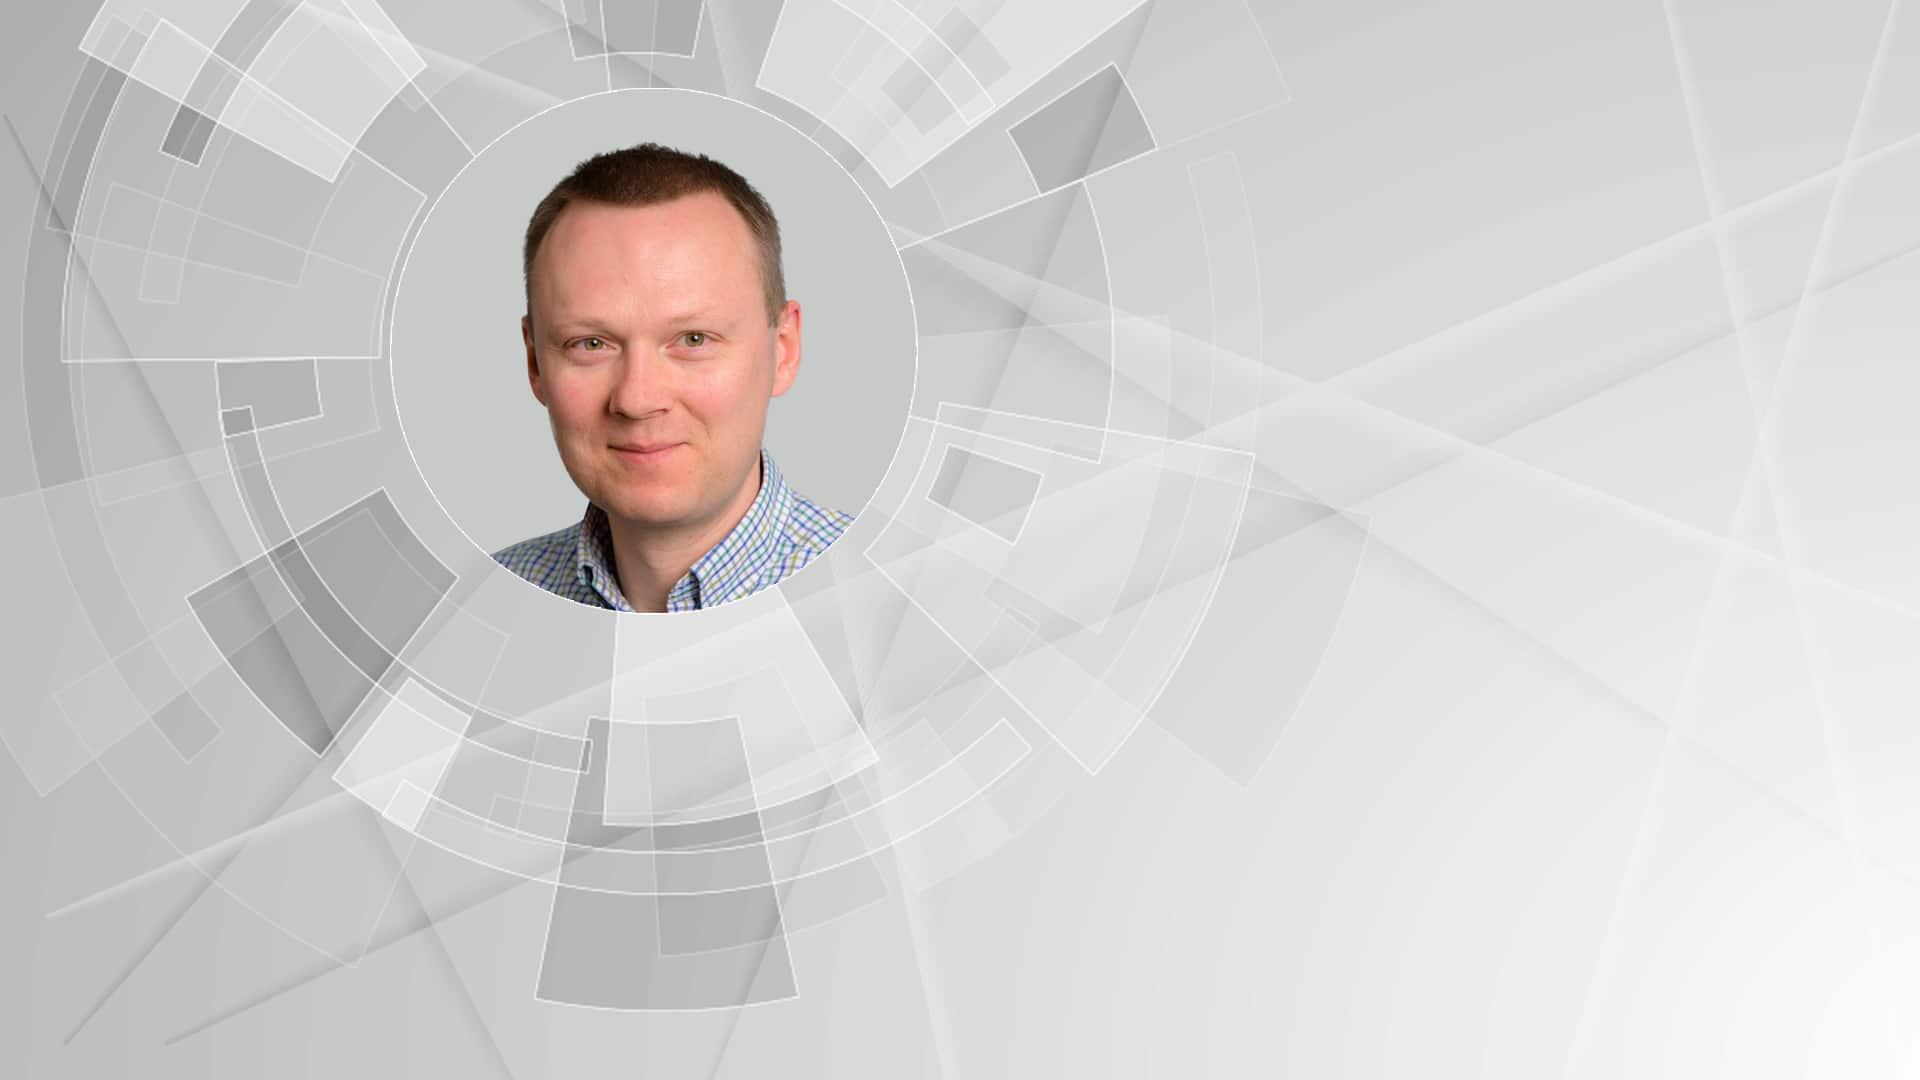 Tibor Novosad, Head of Mobile Apps Dpt, ESET